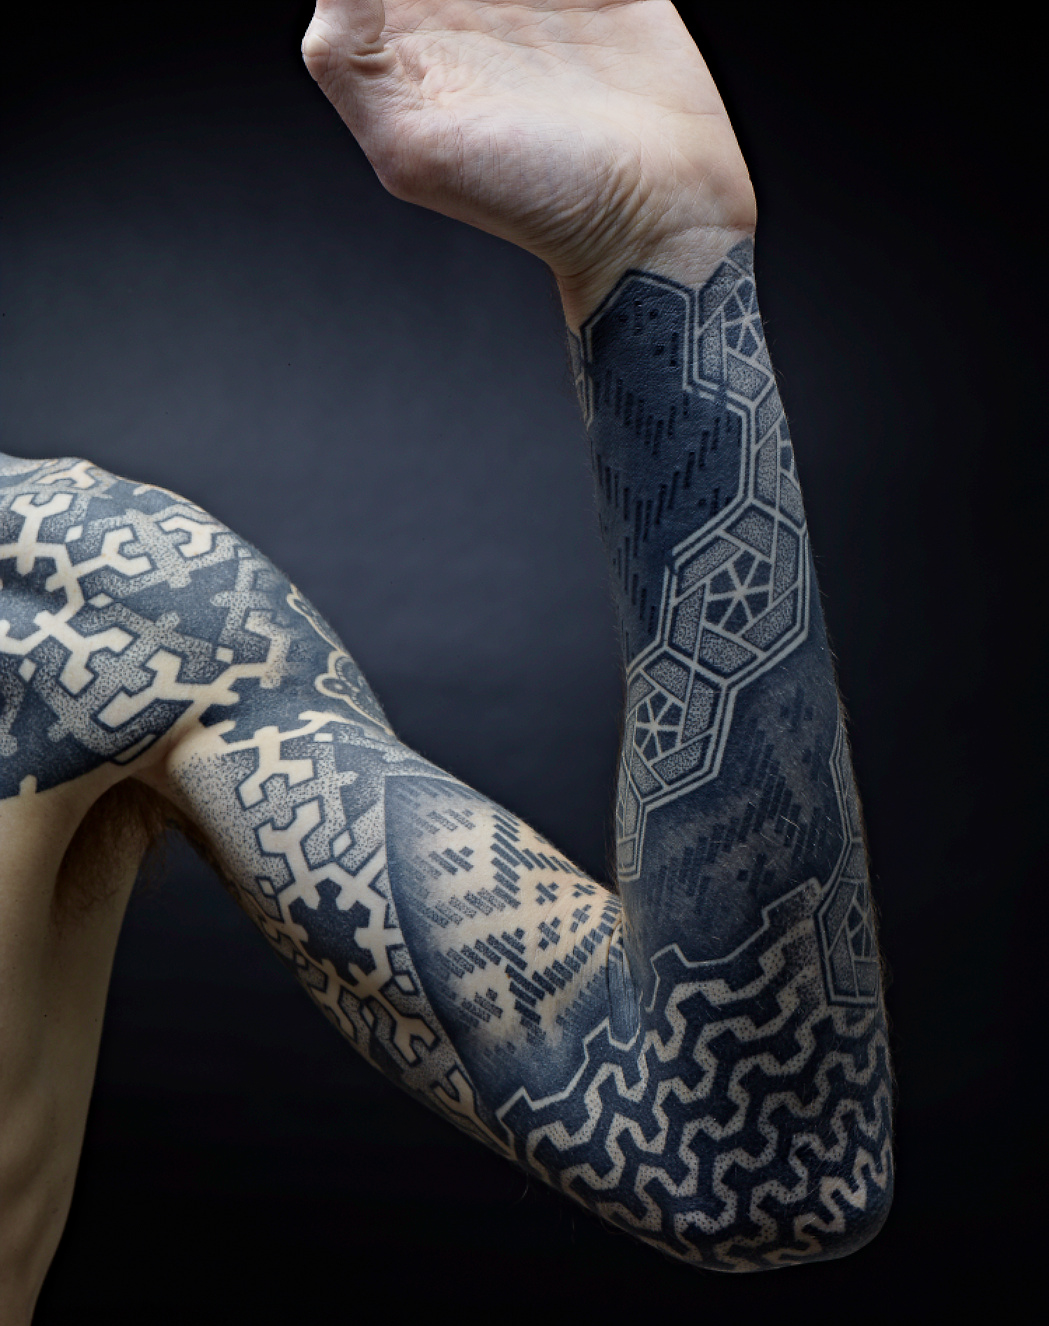 black blue sleeve tattoo google search tattoo right arm ideas pinterest geometric. Black Bedroom Furniture Sets. Home Design Ideas